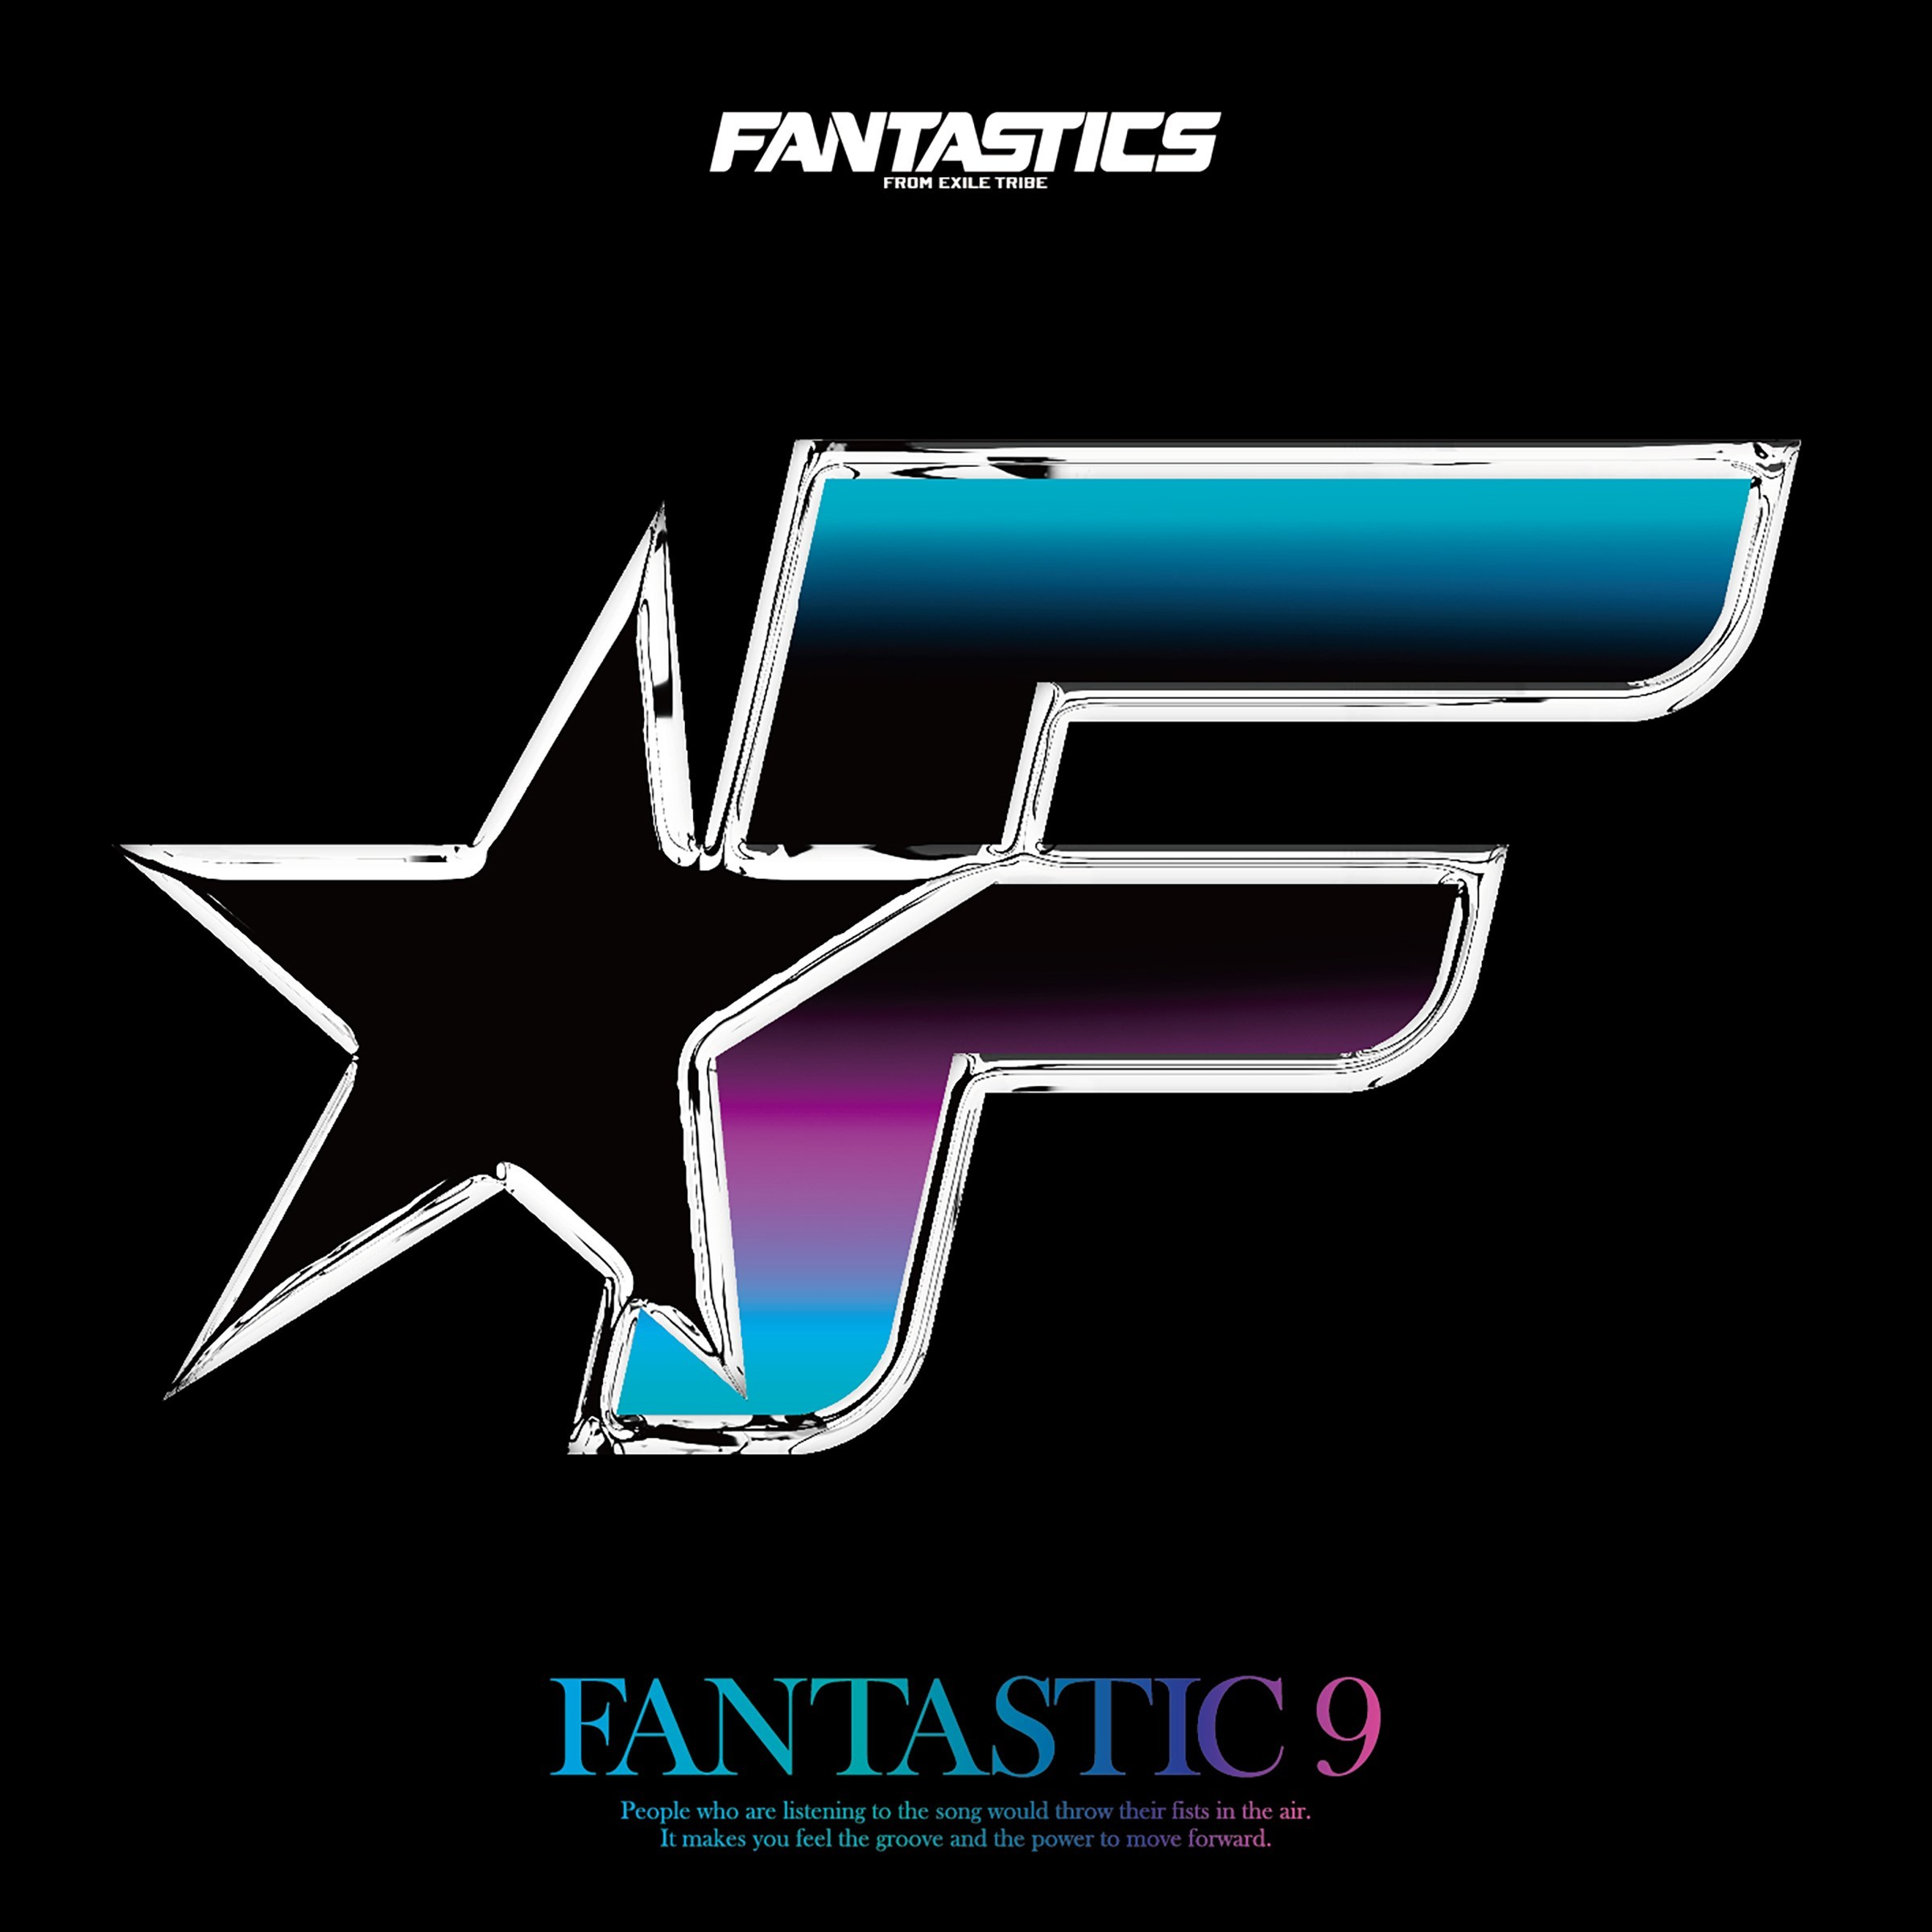 『FANTASTIC 9』